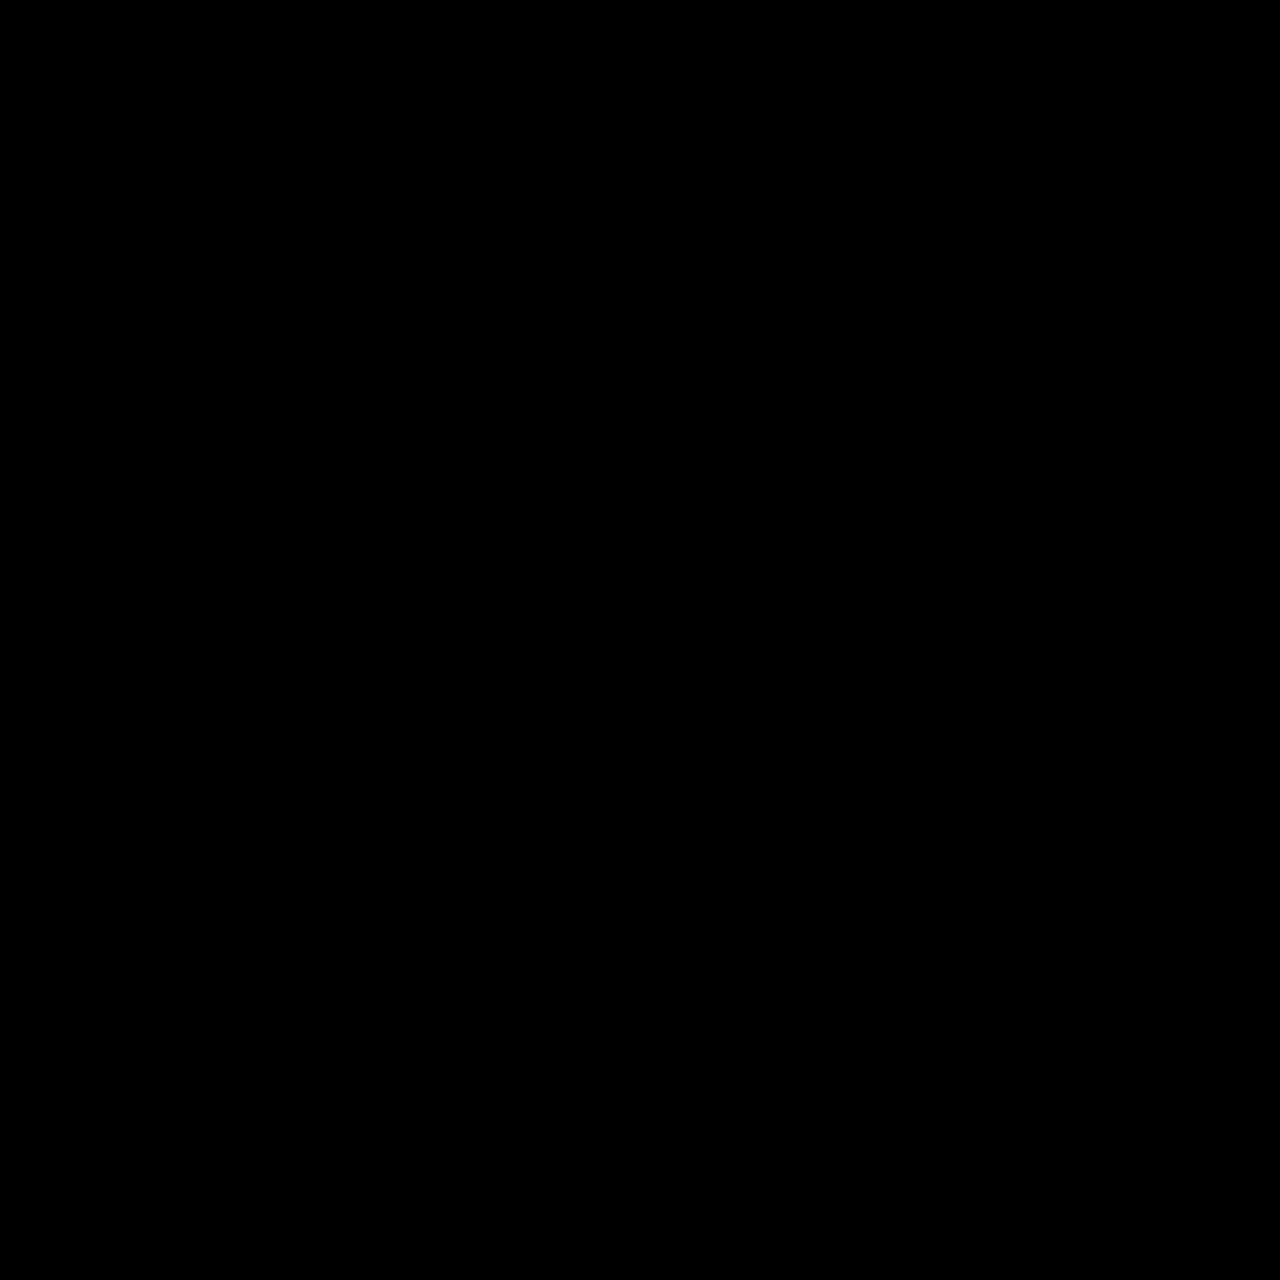 quality-black-50x50